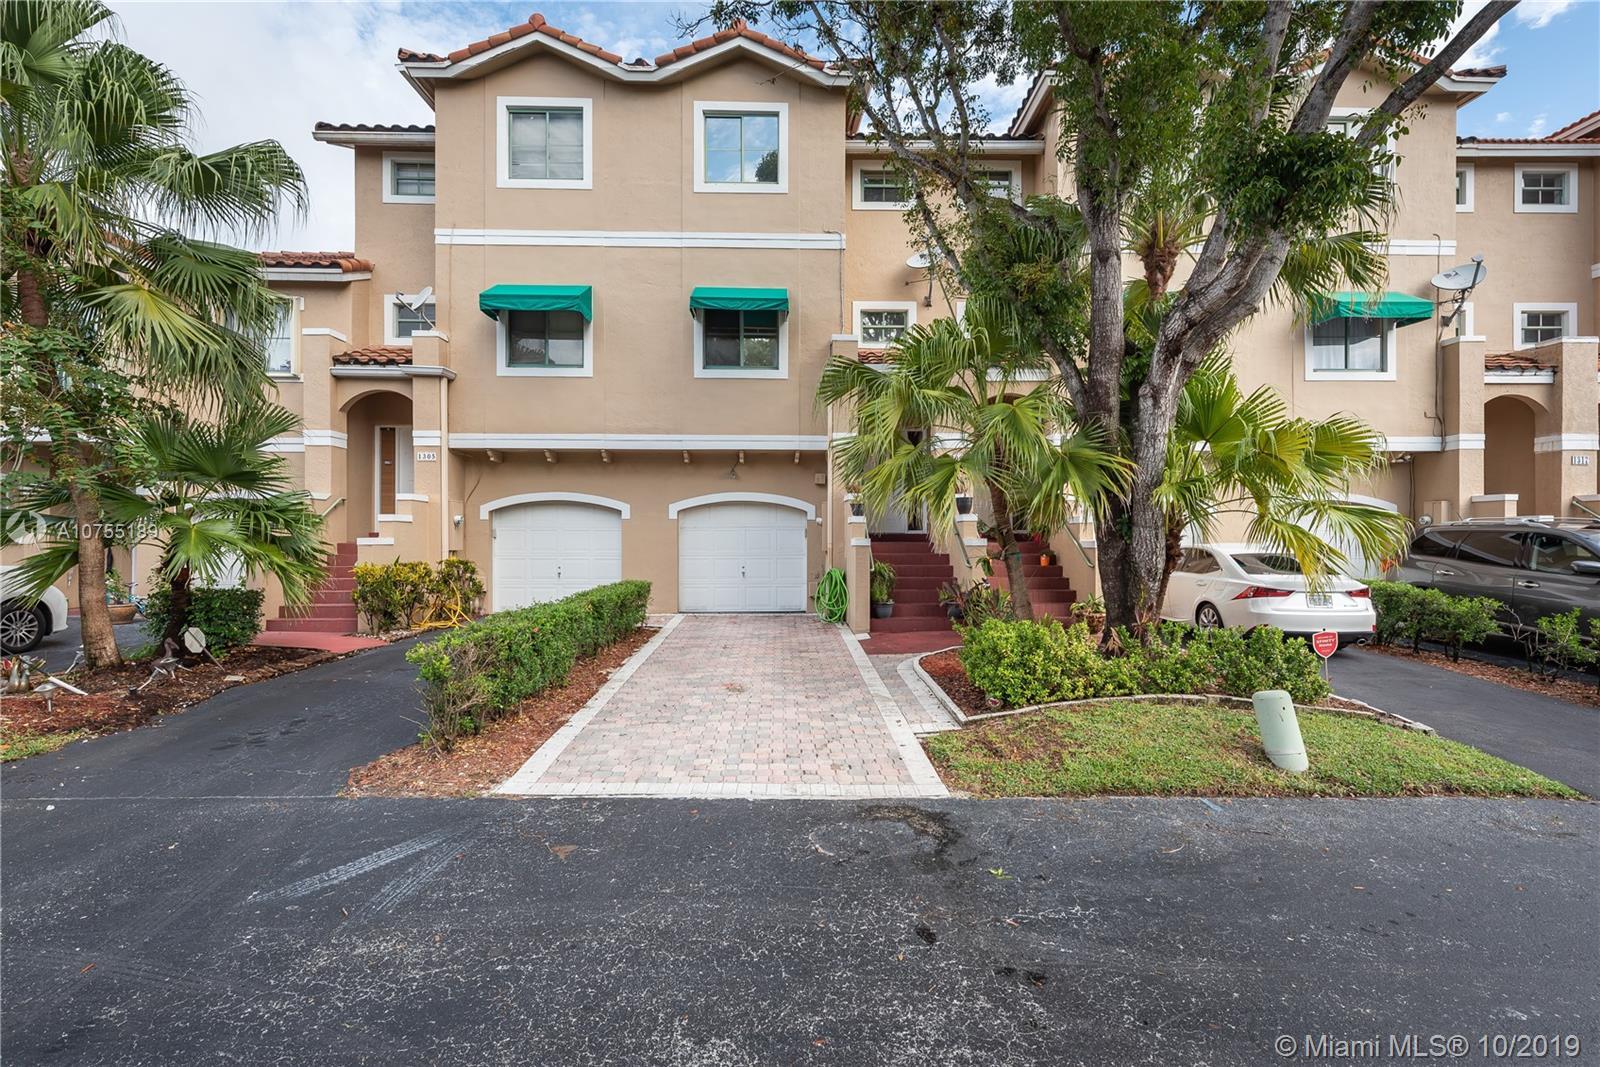 Property for sale at 1309 NW 126th Ave # 1306, Sunrise FL 33323 Unit 1306, Sunrise,  Florida 33323